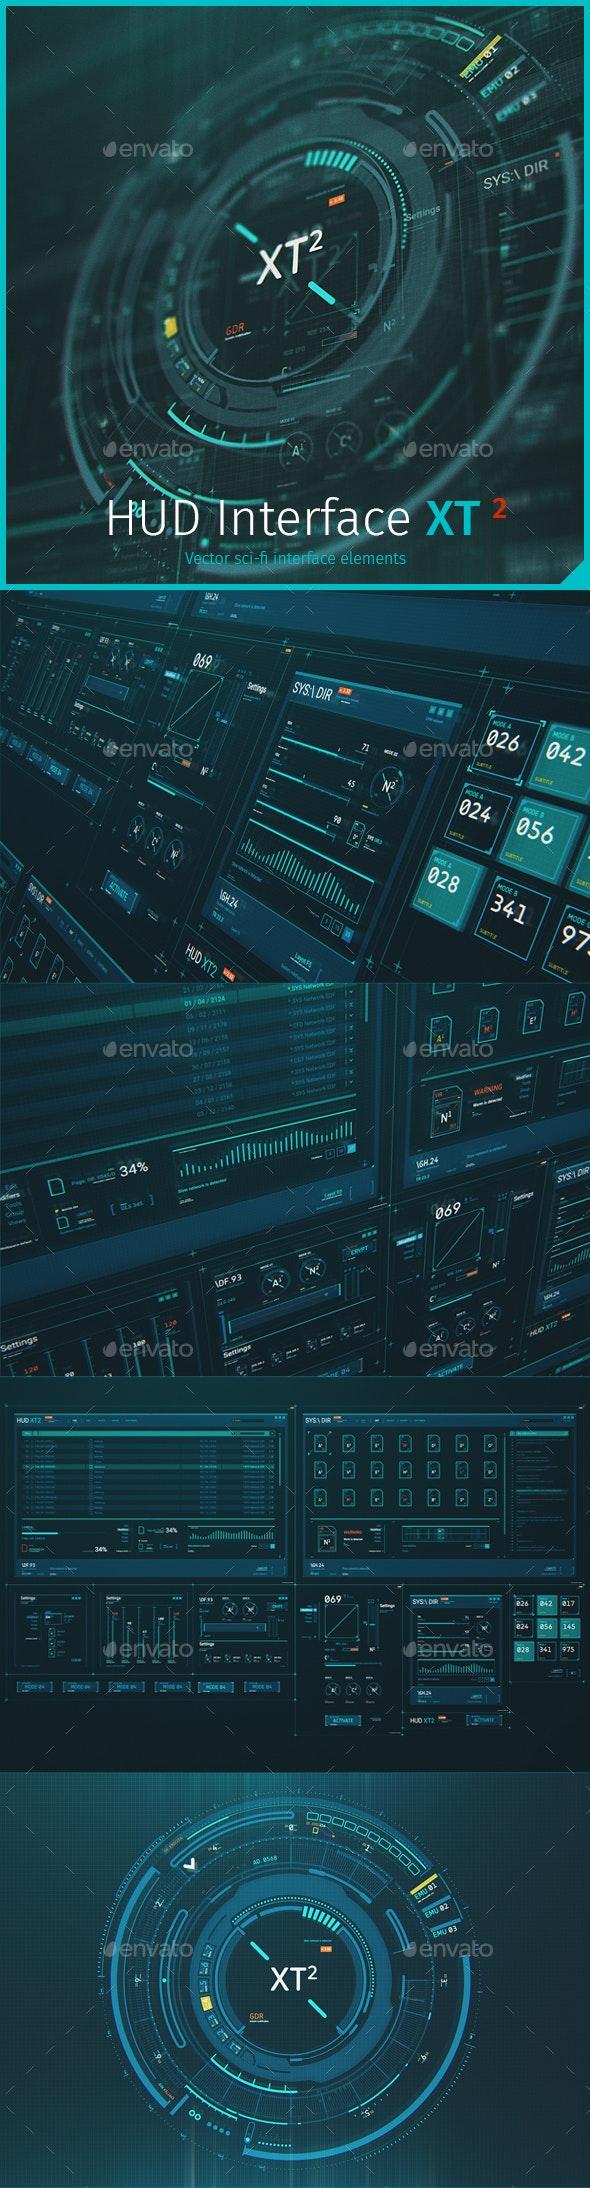 Futuristic HUD Interface XT2: Sci-Fi UI Elements - User Interfaces Web Elements